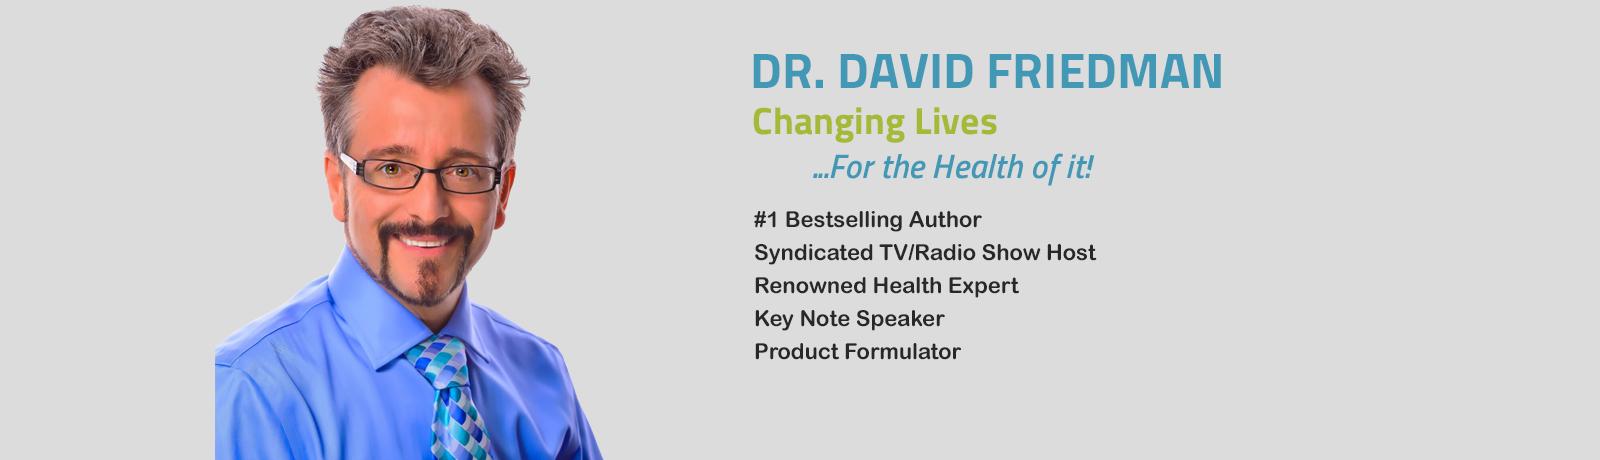 doctor david friedman